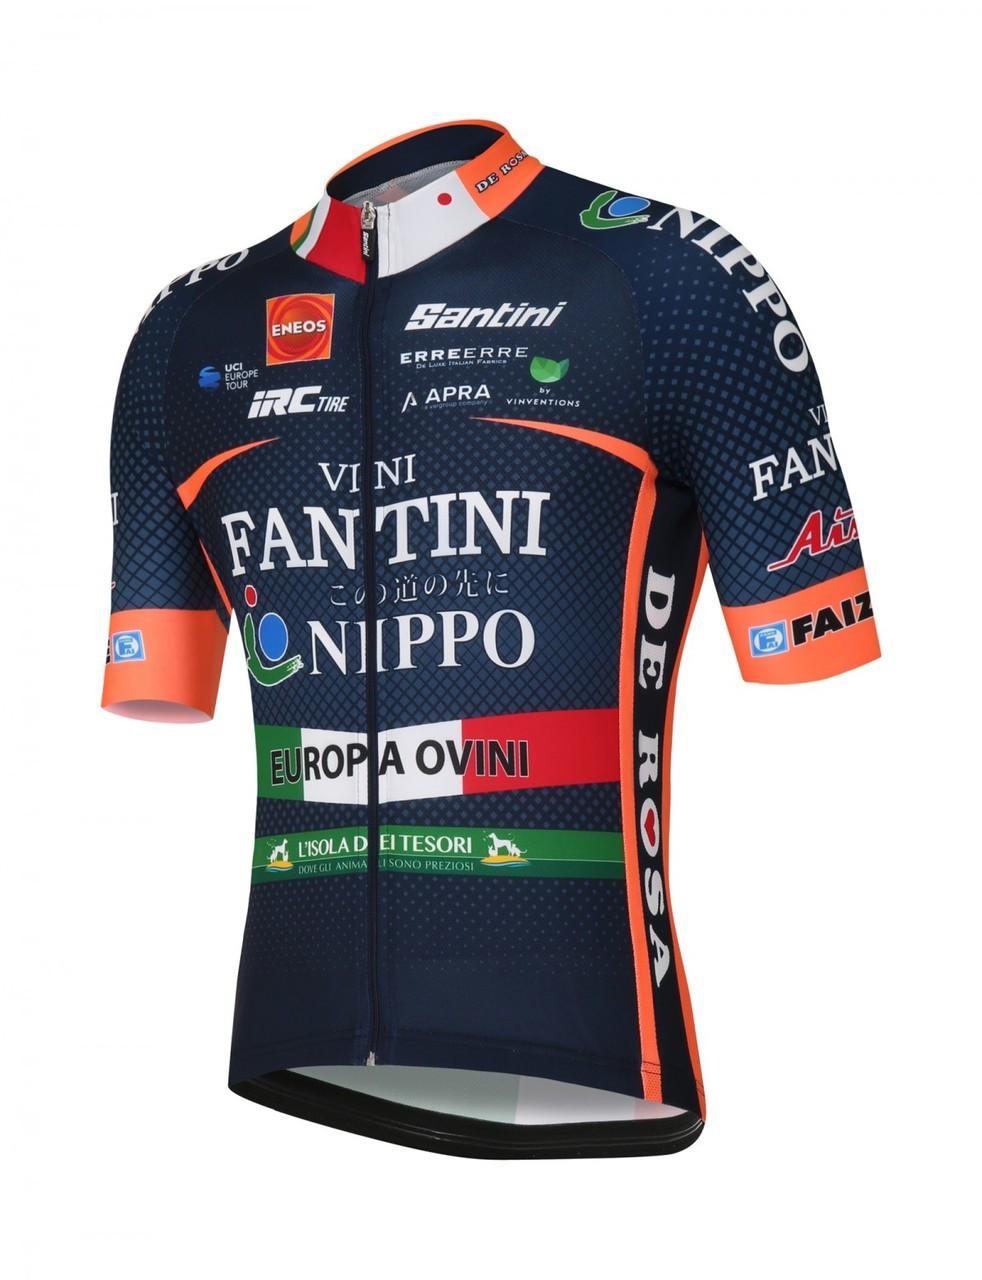 2018 Vini Fantini FZ Jersey